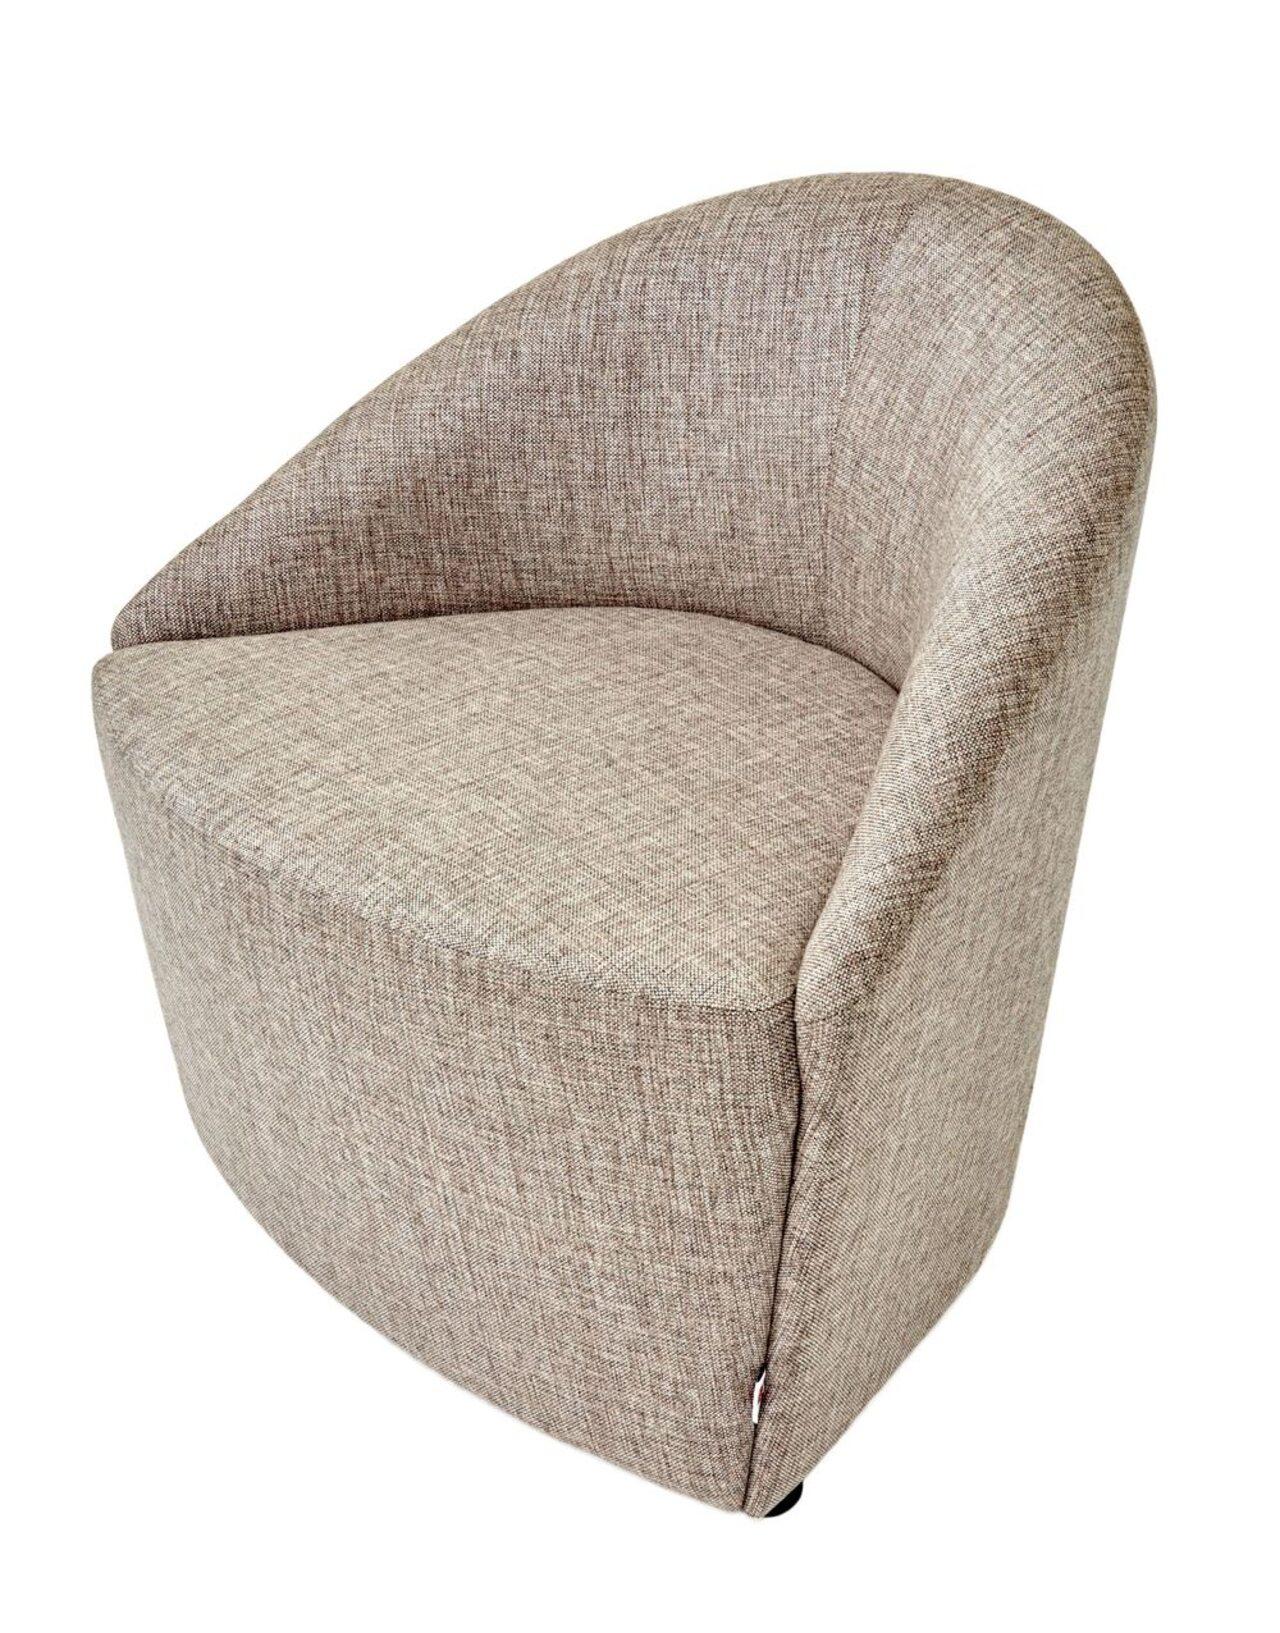 Кресло стационарное  3D 79x65x71 - фото 4